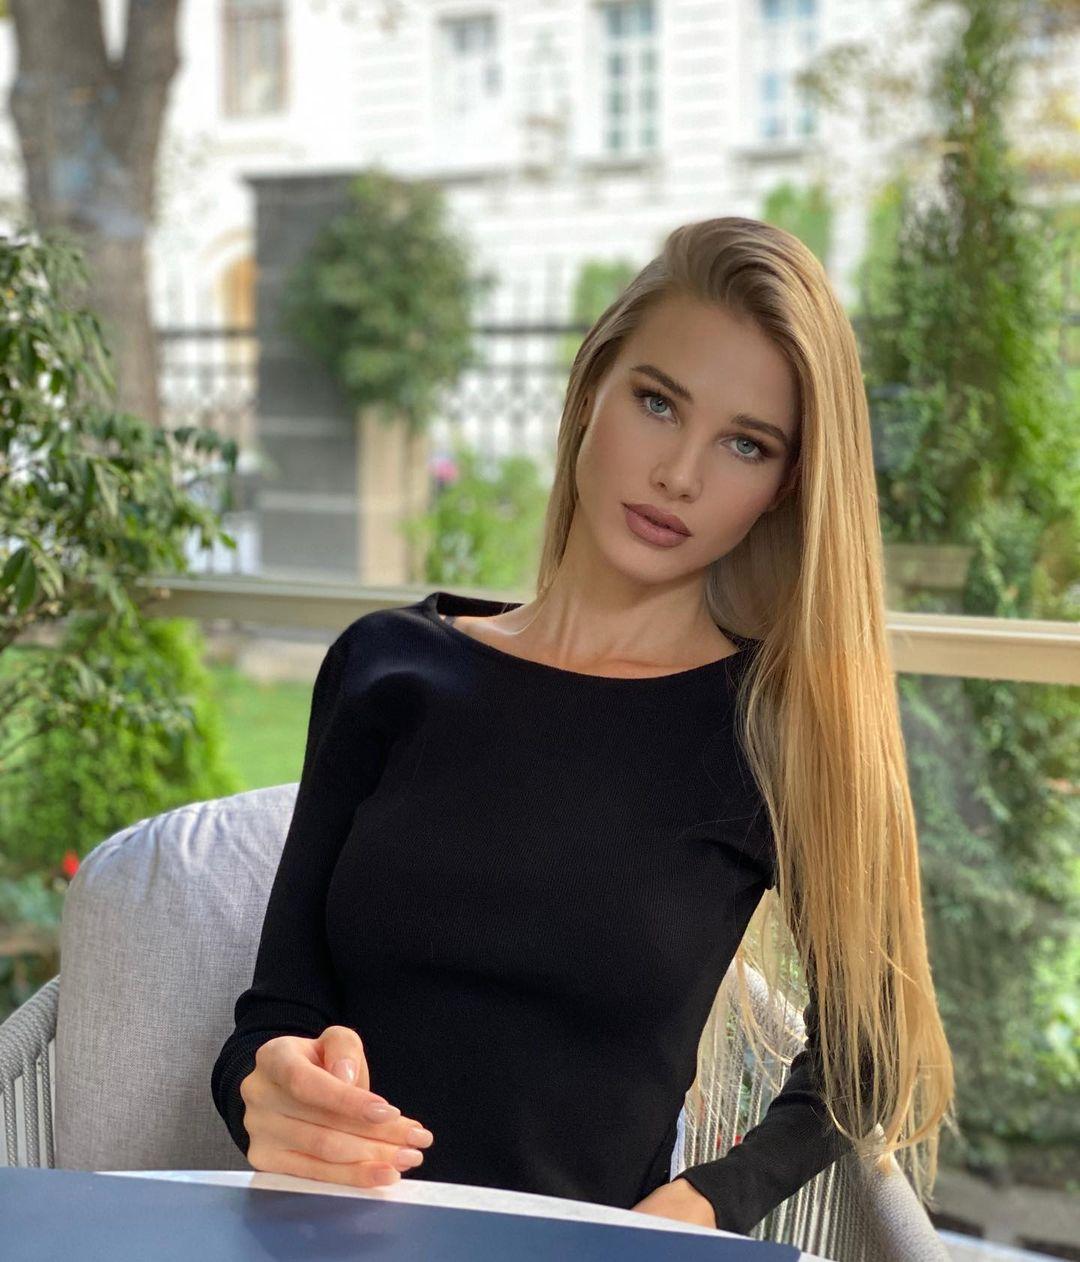 Alena-Kryukova-Wallpapers-Insta-Biography-6